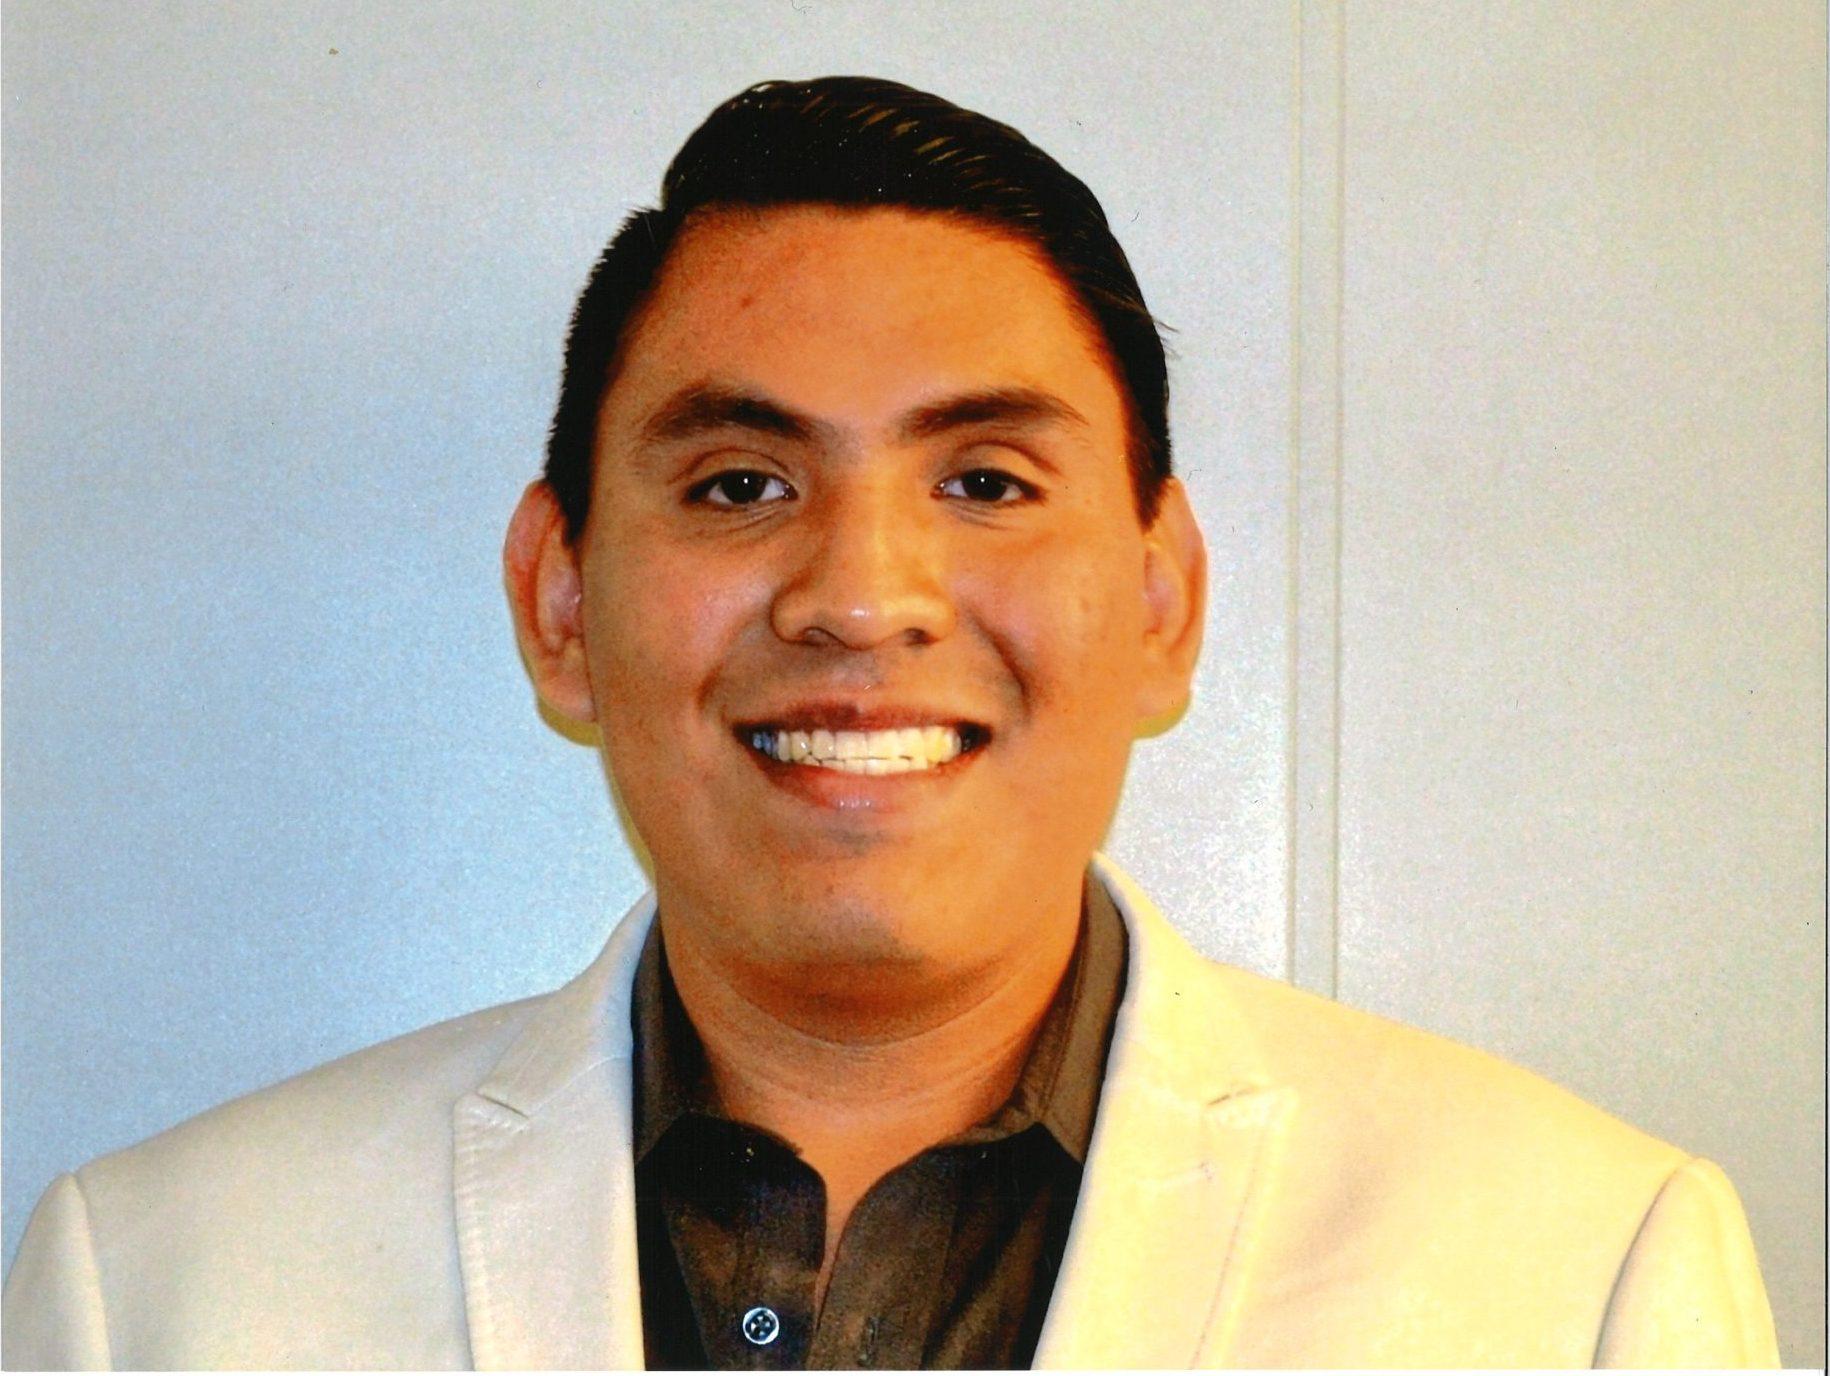 Francisco Cartujano